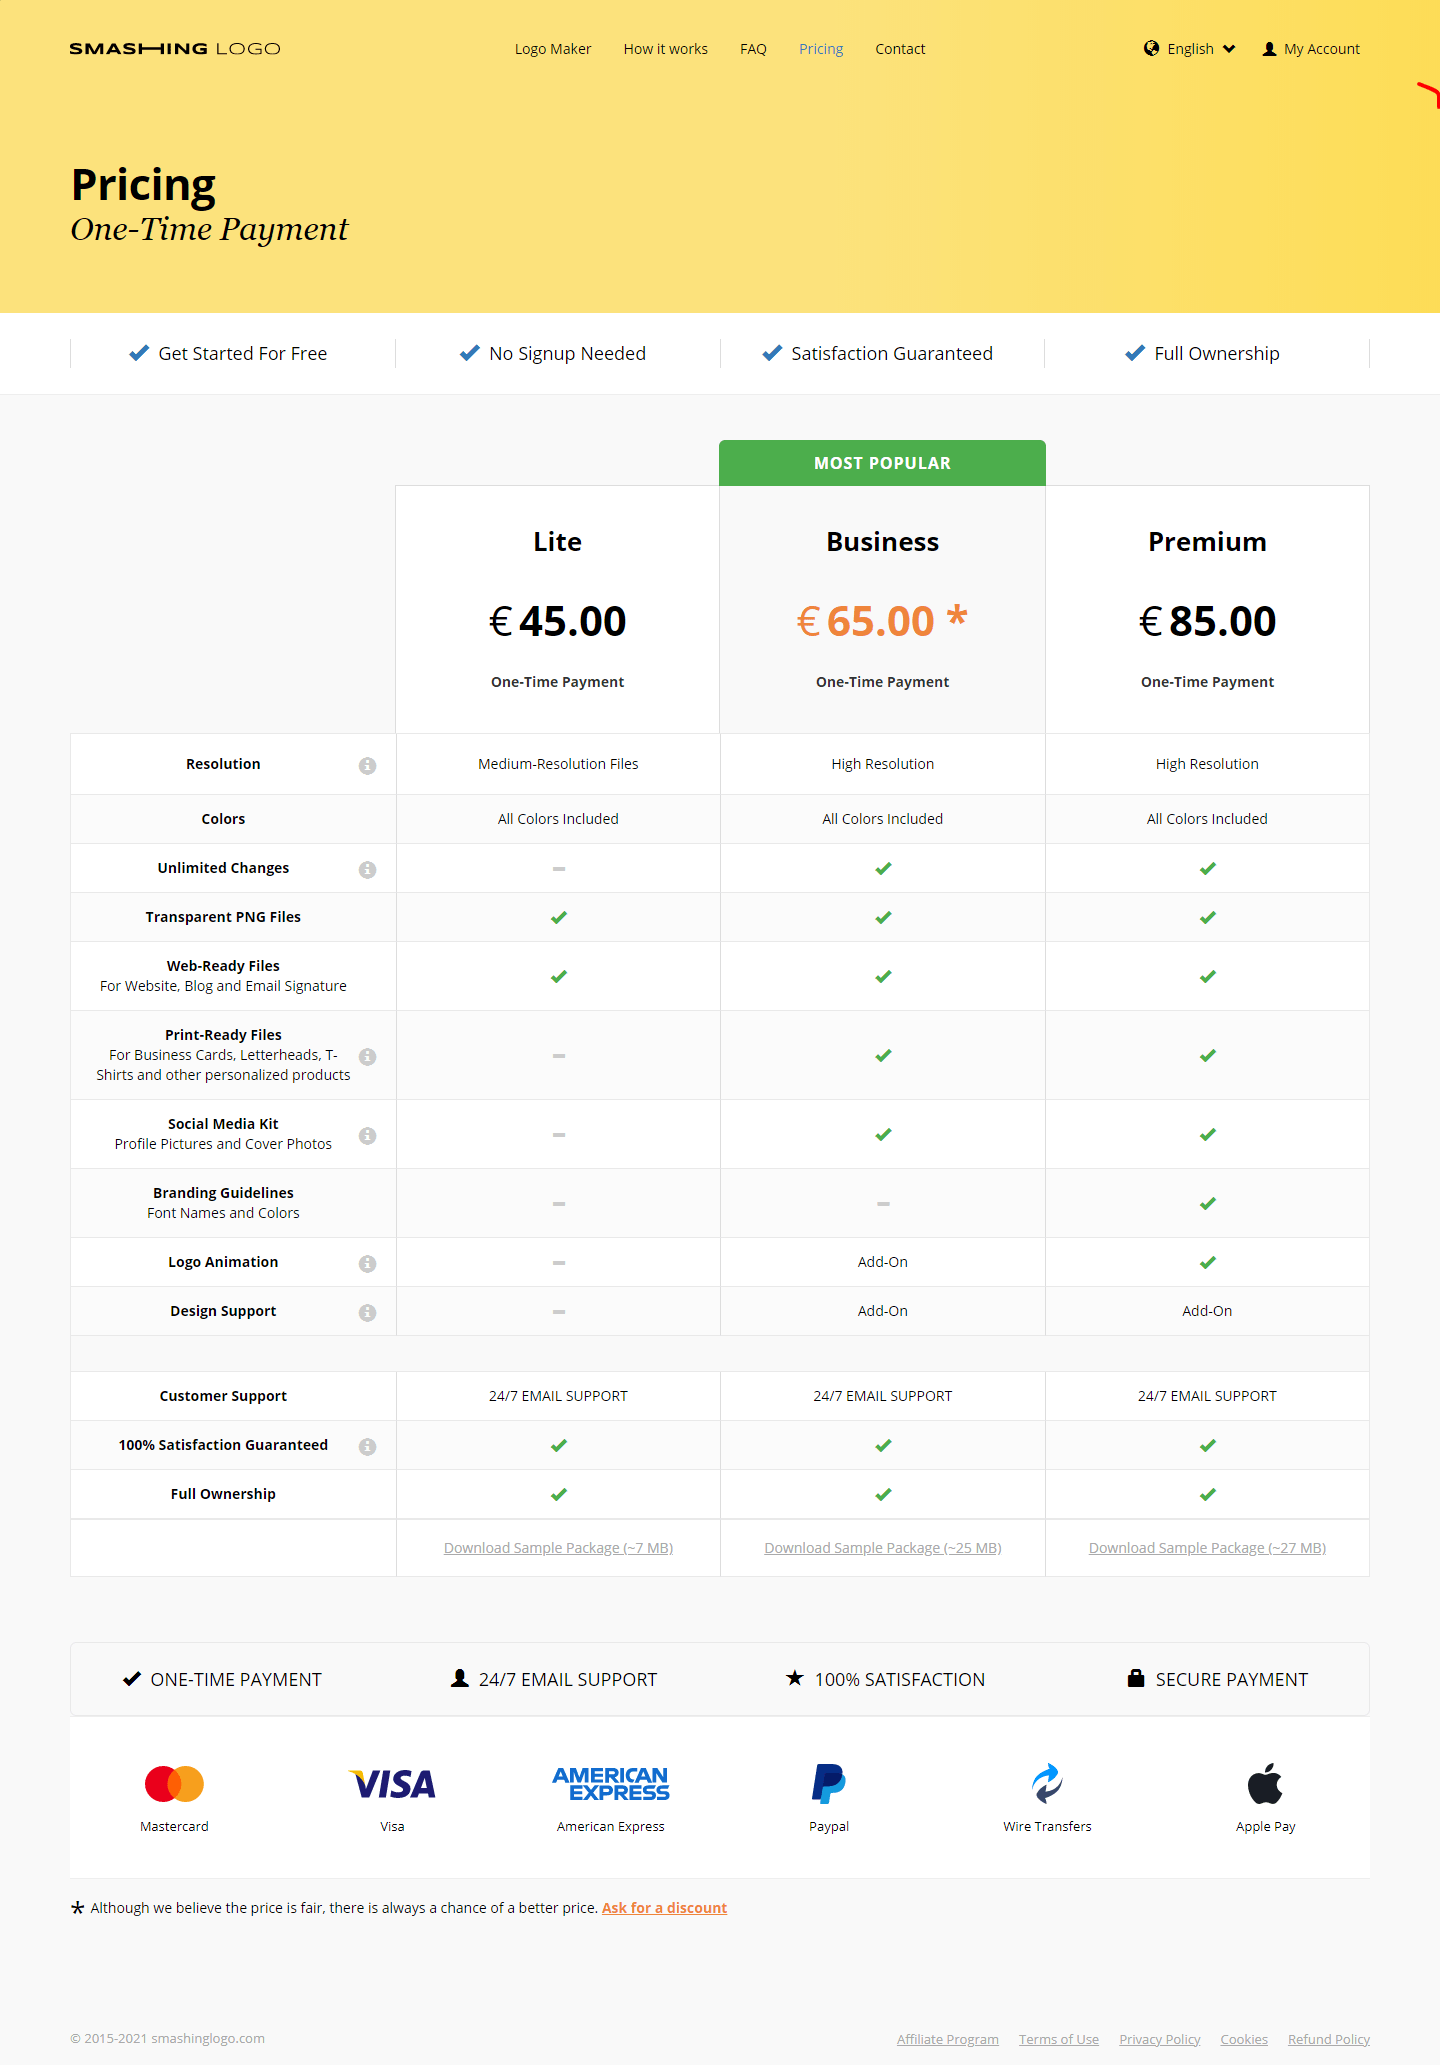 SMASHINGLOGO-_Pricing